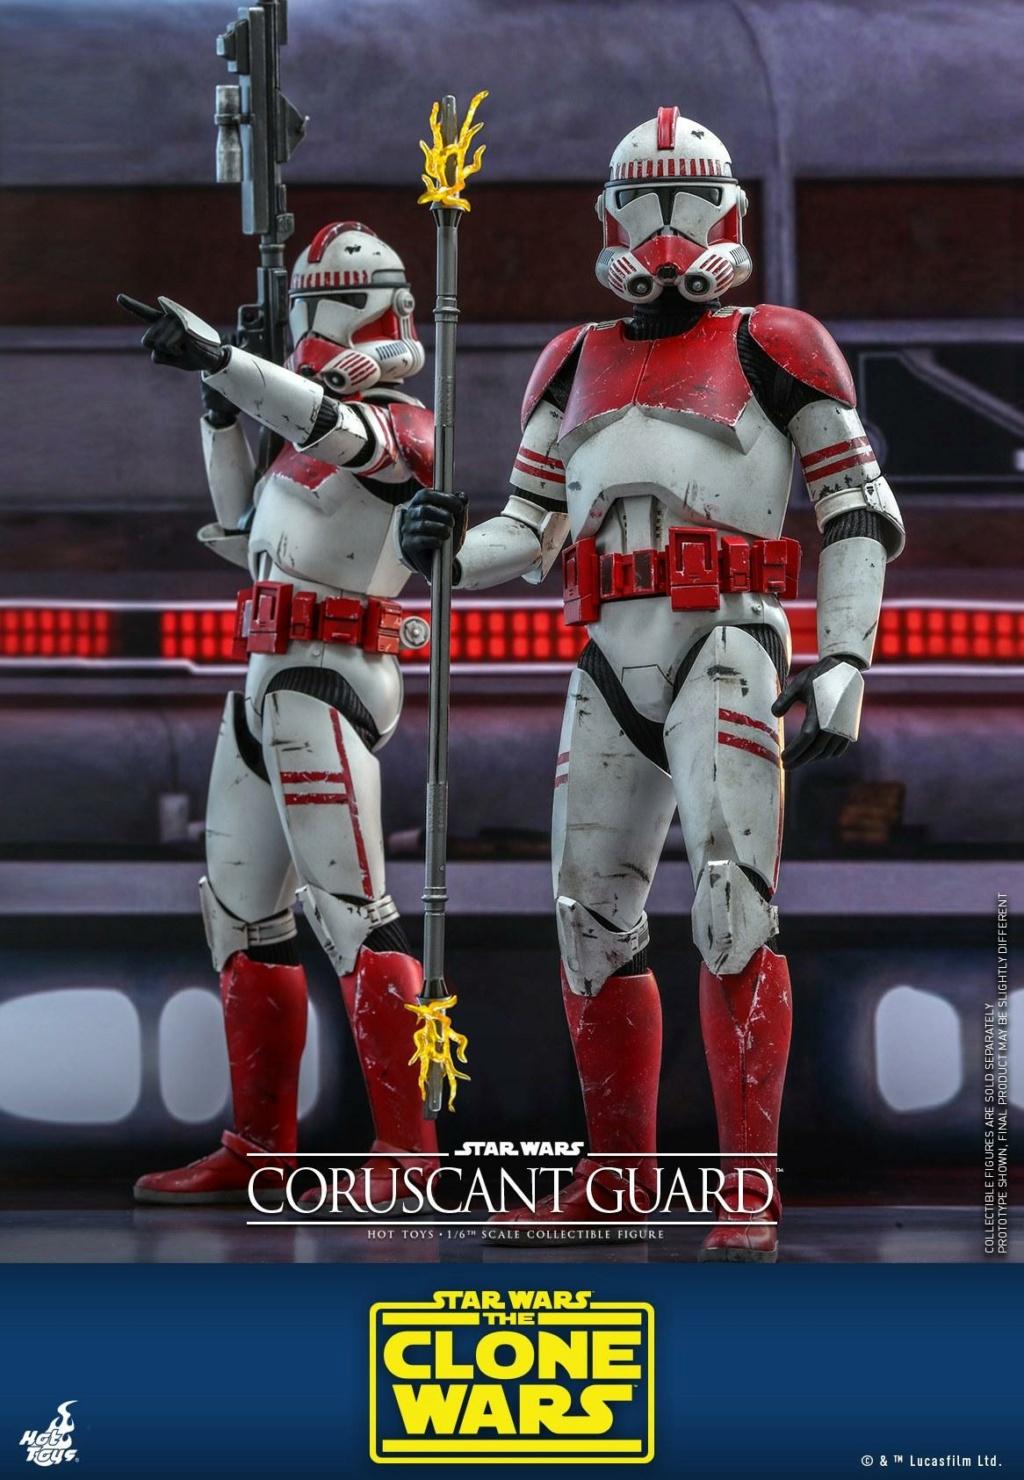 Coruscant Guard - 1/6th Figure - The Clone Wars - Hot Toys Corusc11